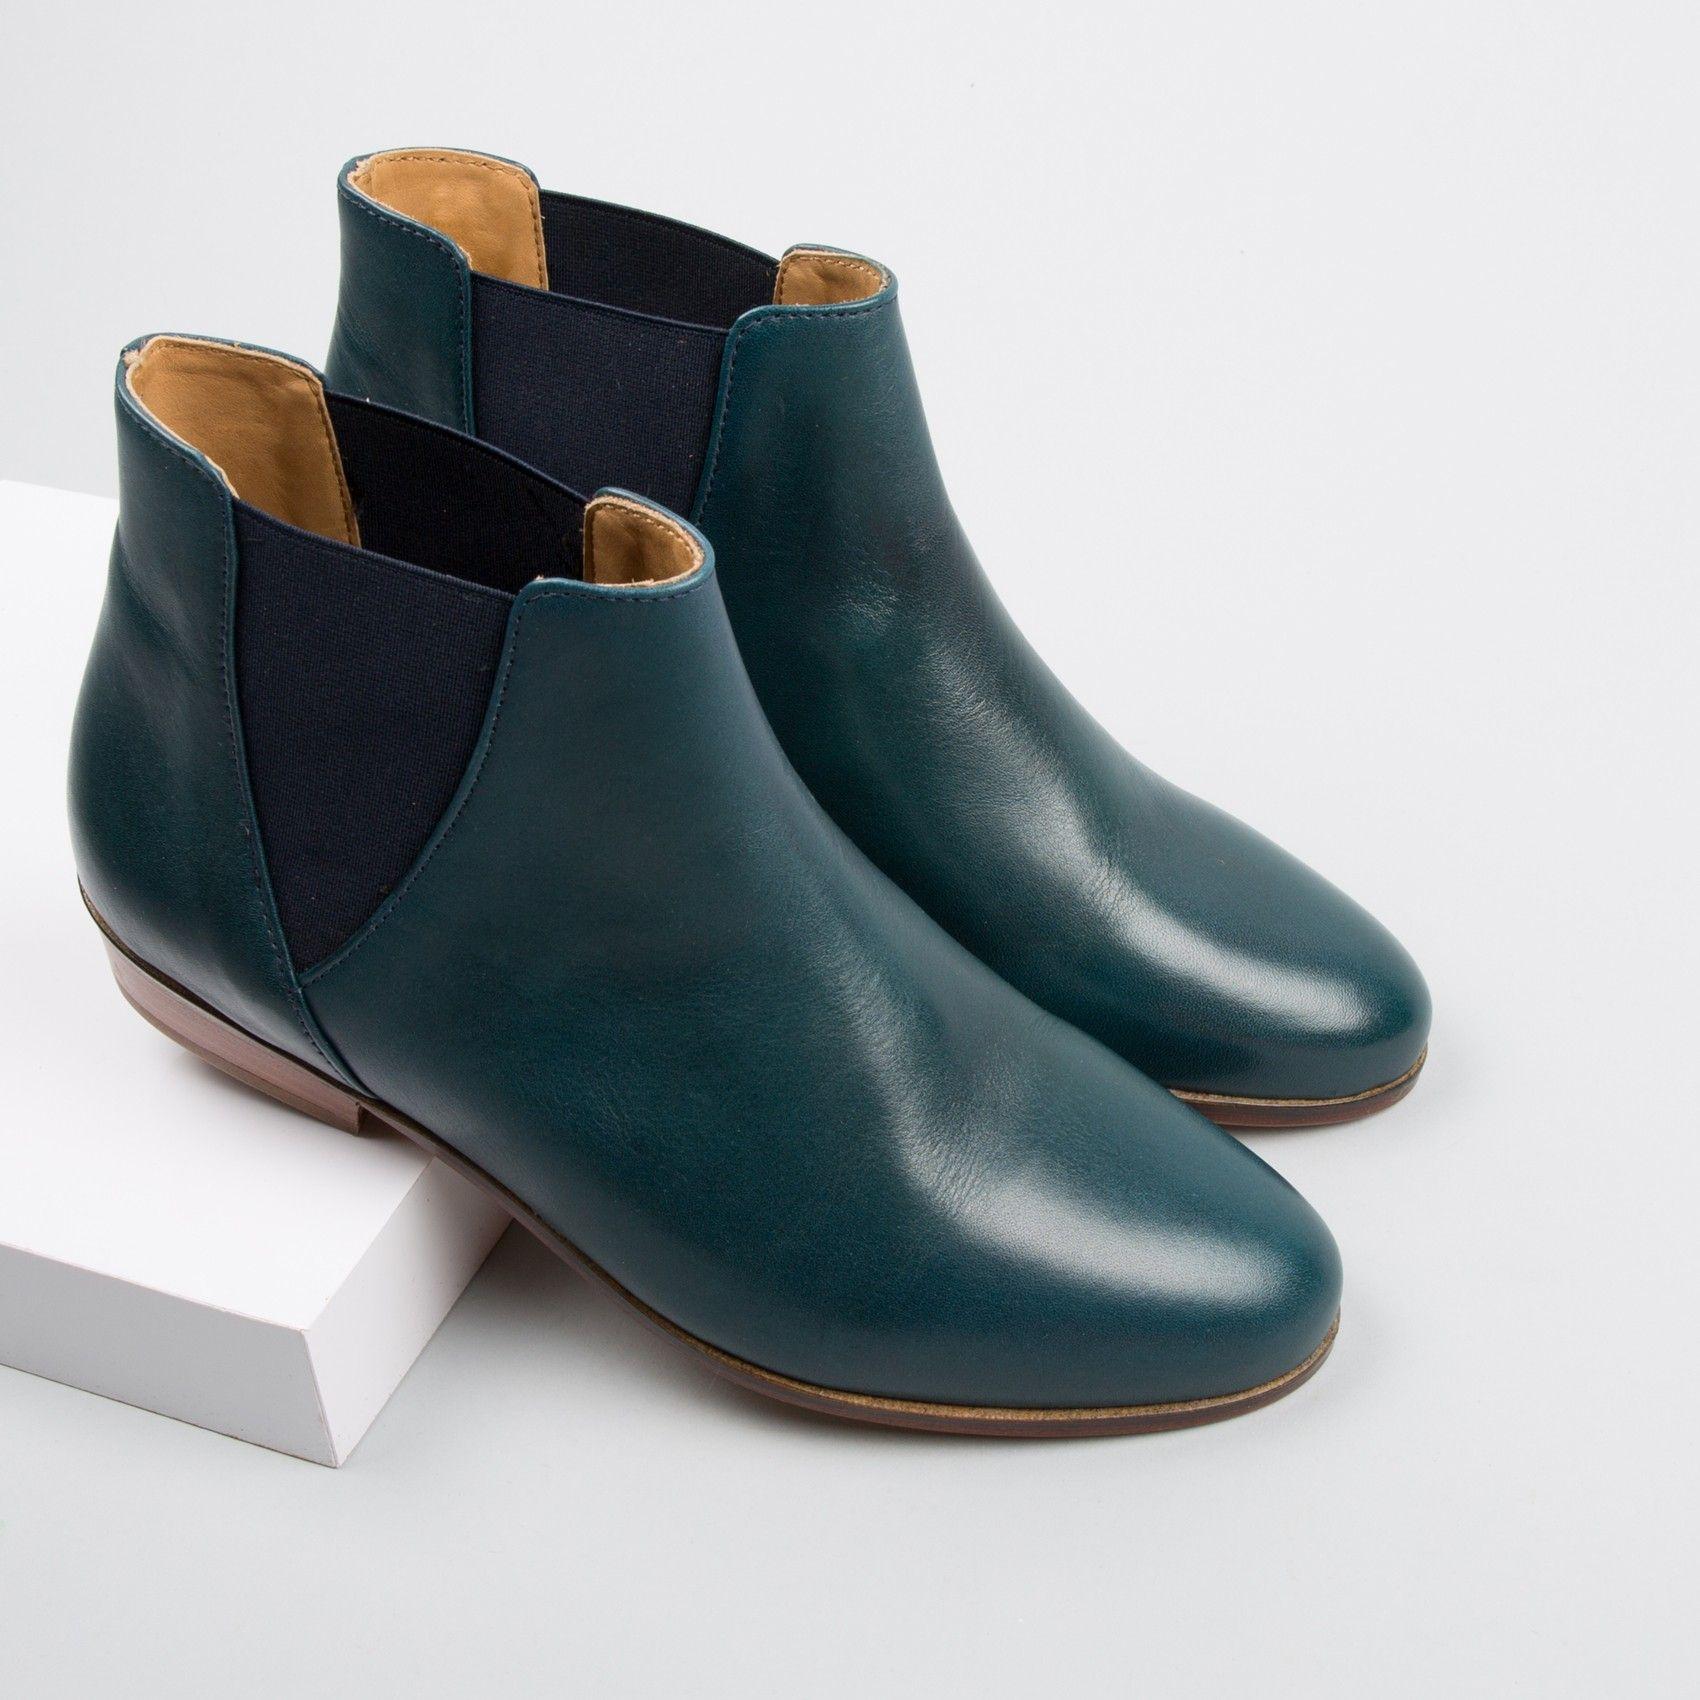 chelsea boots bleu bor al marine la londonienne. Black Bedroom Furniture Sets. Home Design Ideas